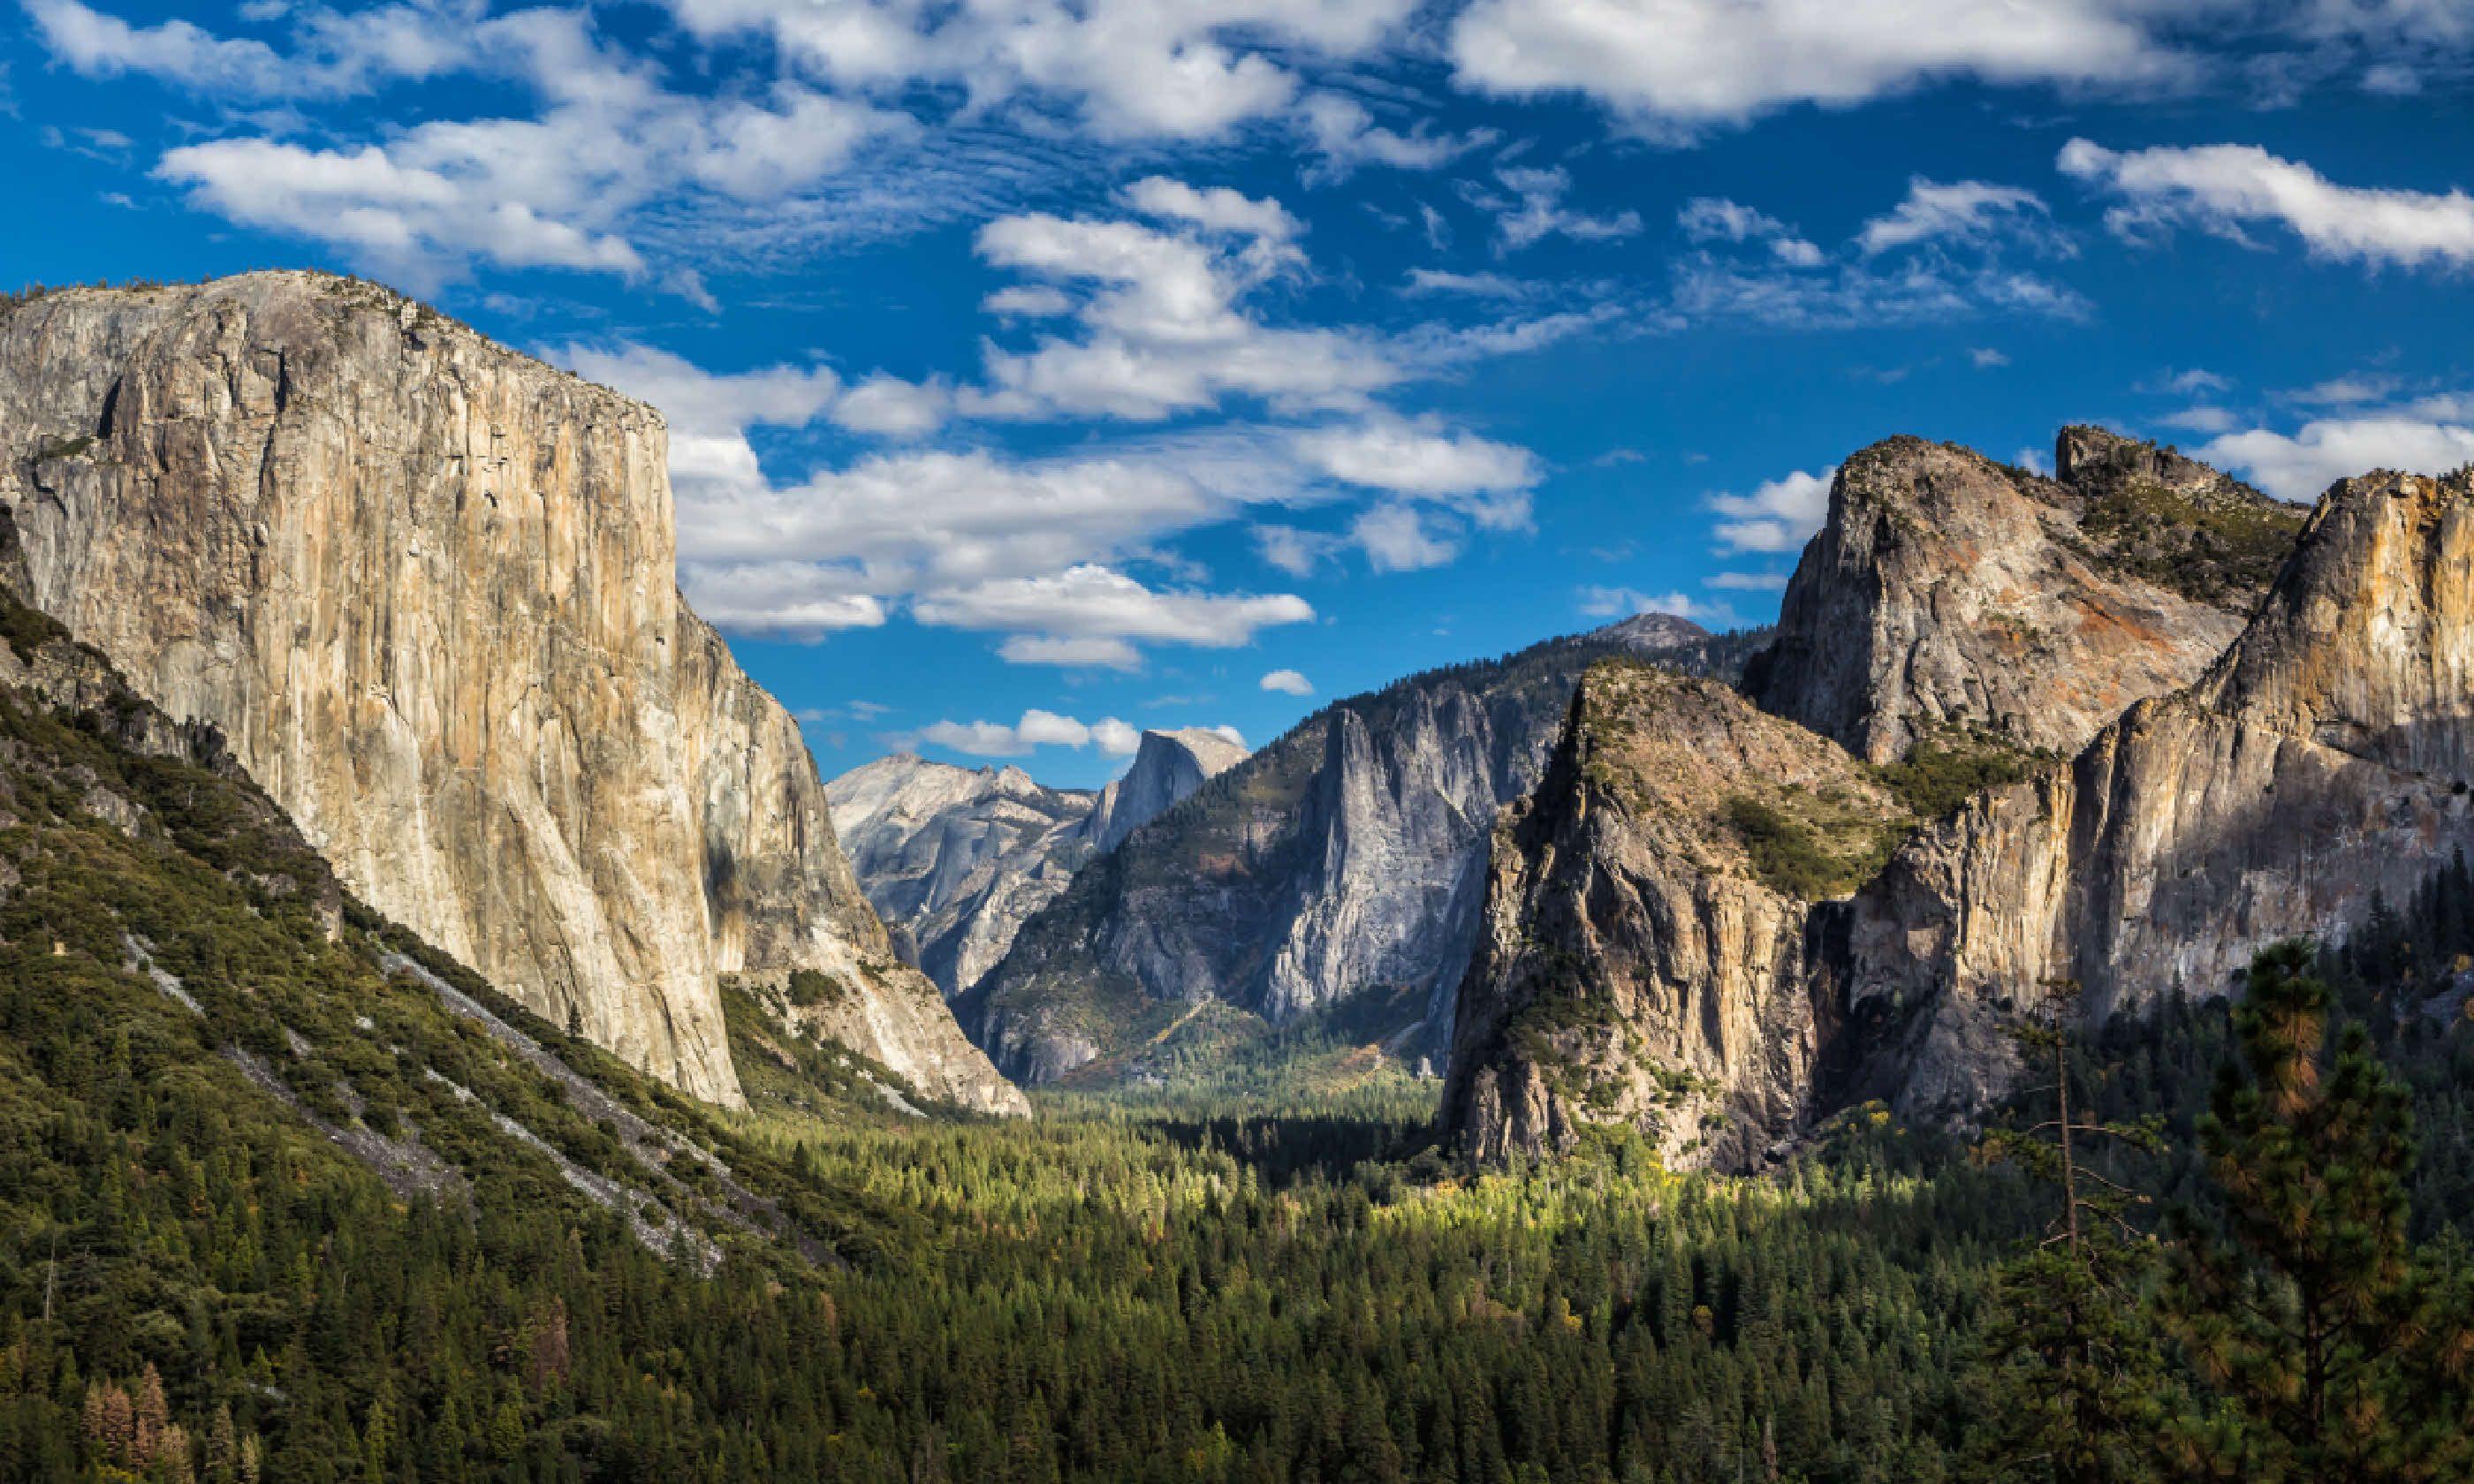 Yosemite National Park Valley (Shutterstock)